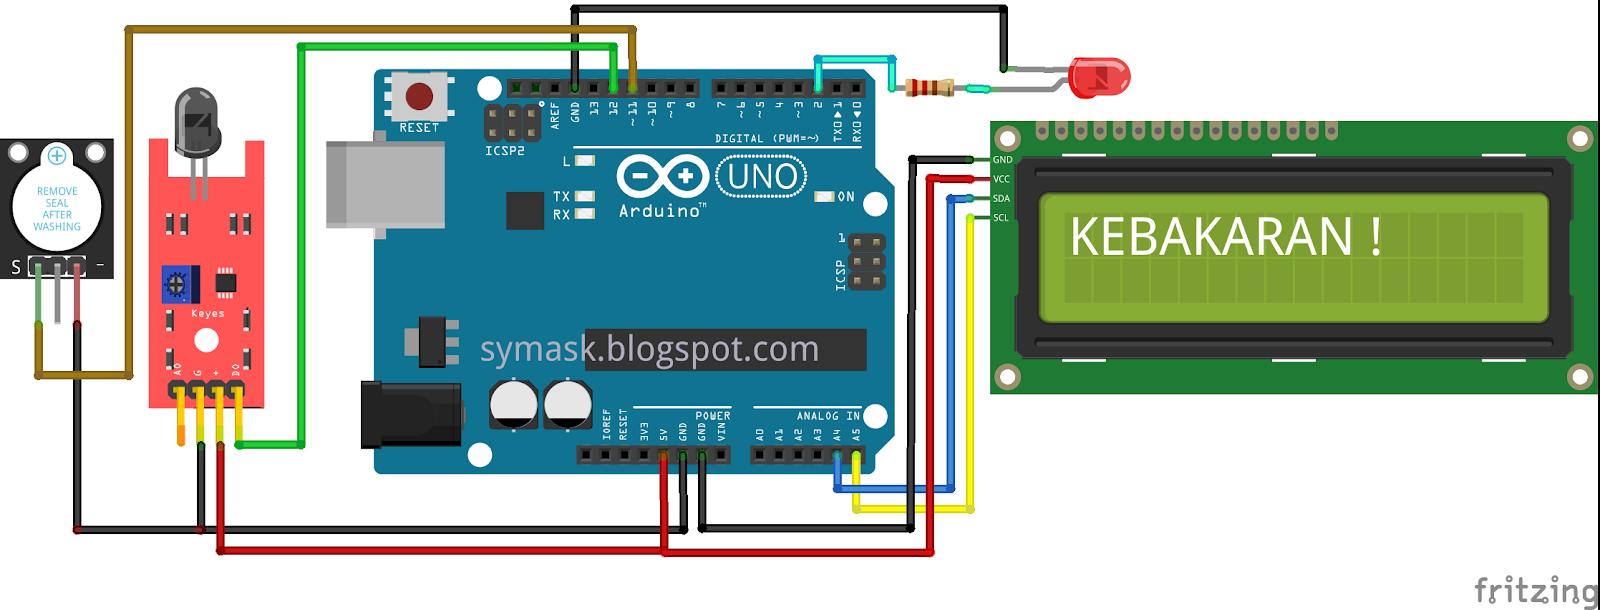 Cara Menggunakan Sensor Api (Flame Sensor) pada Arduino - Symask